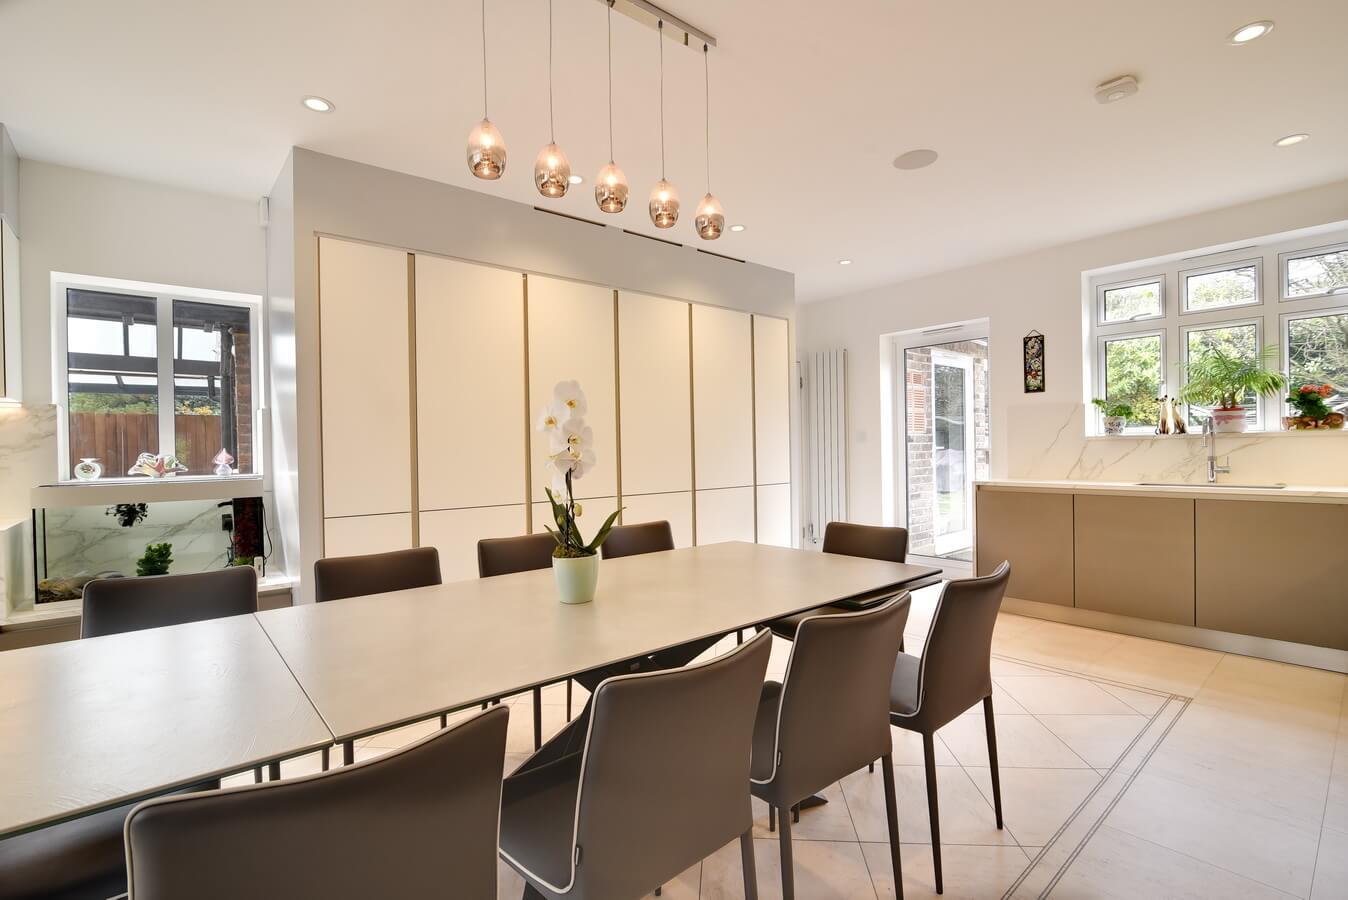 Dining-Table-Kitchen-Tall-Units-Next125.jpg